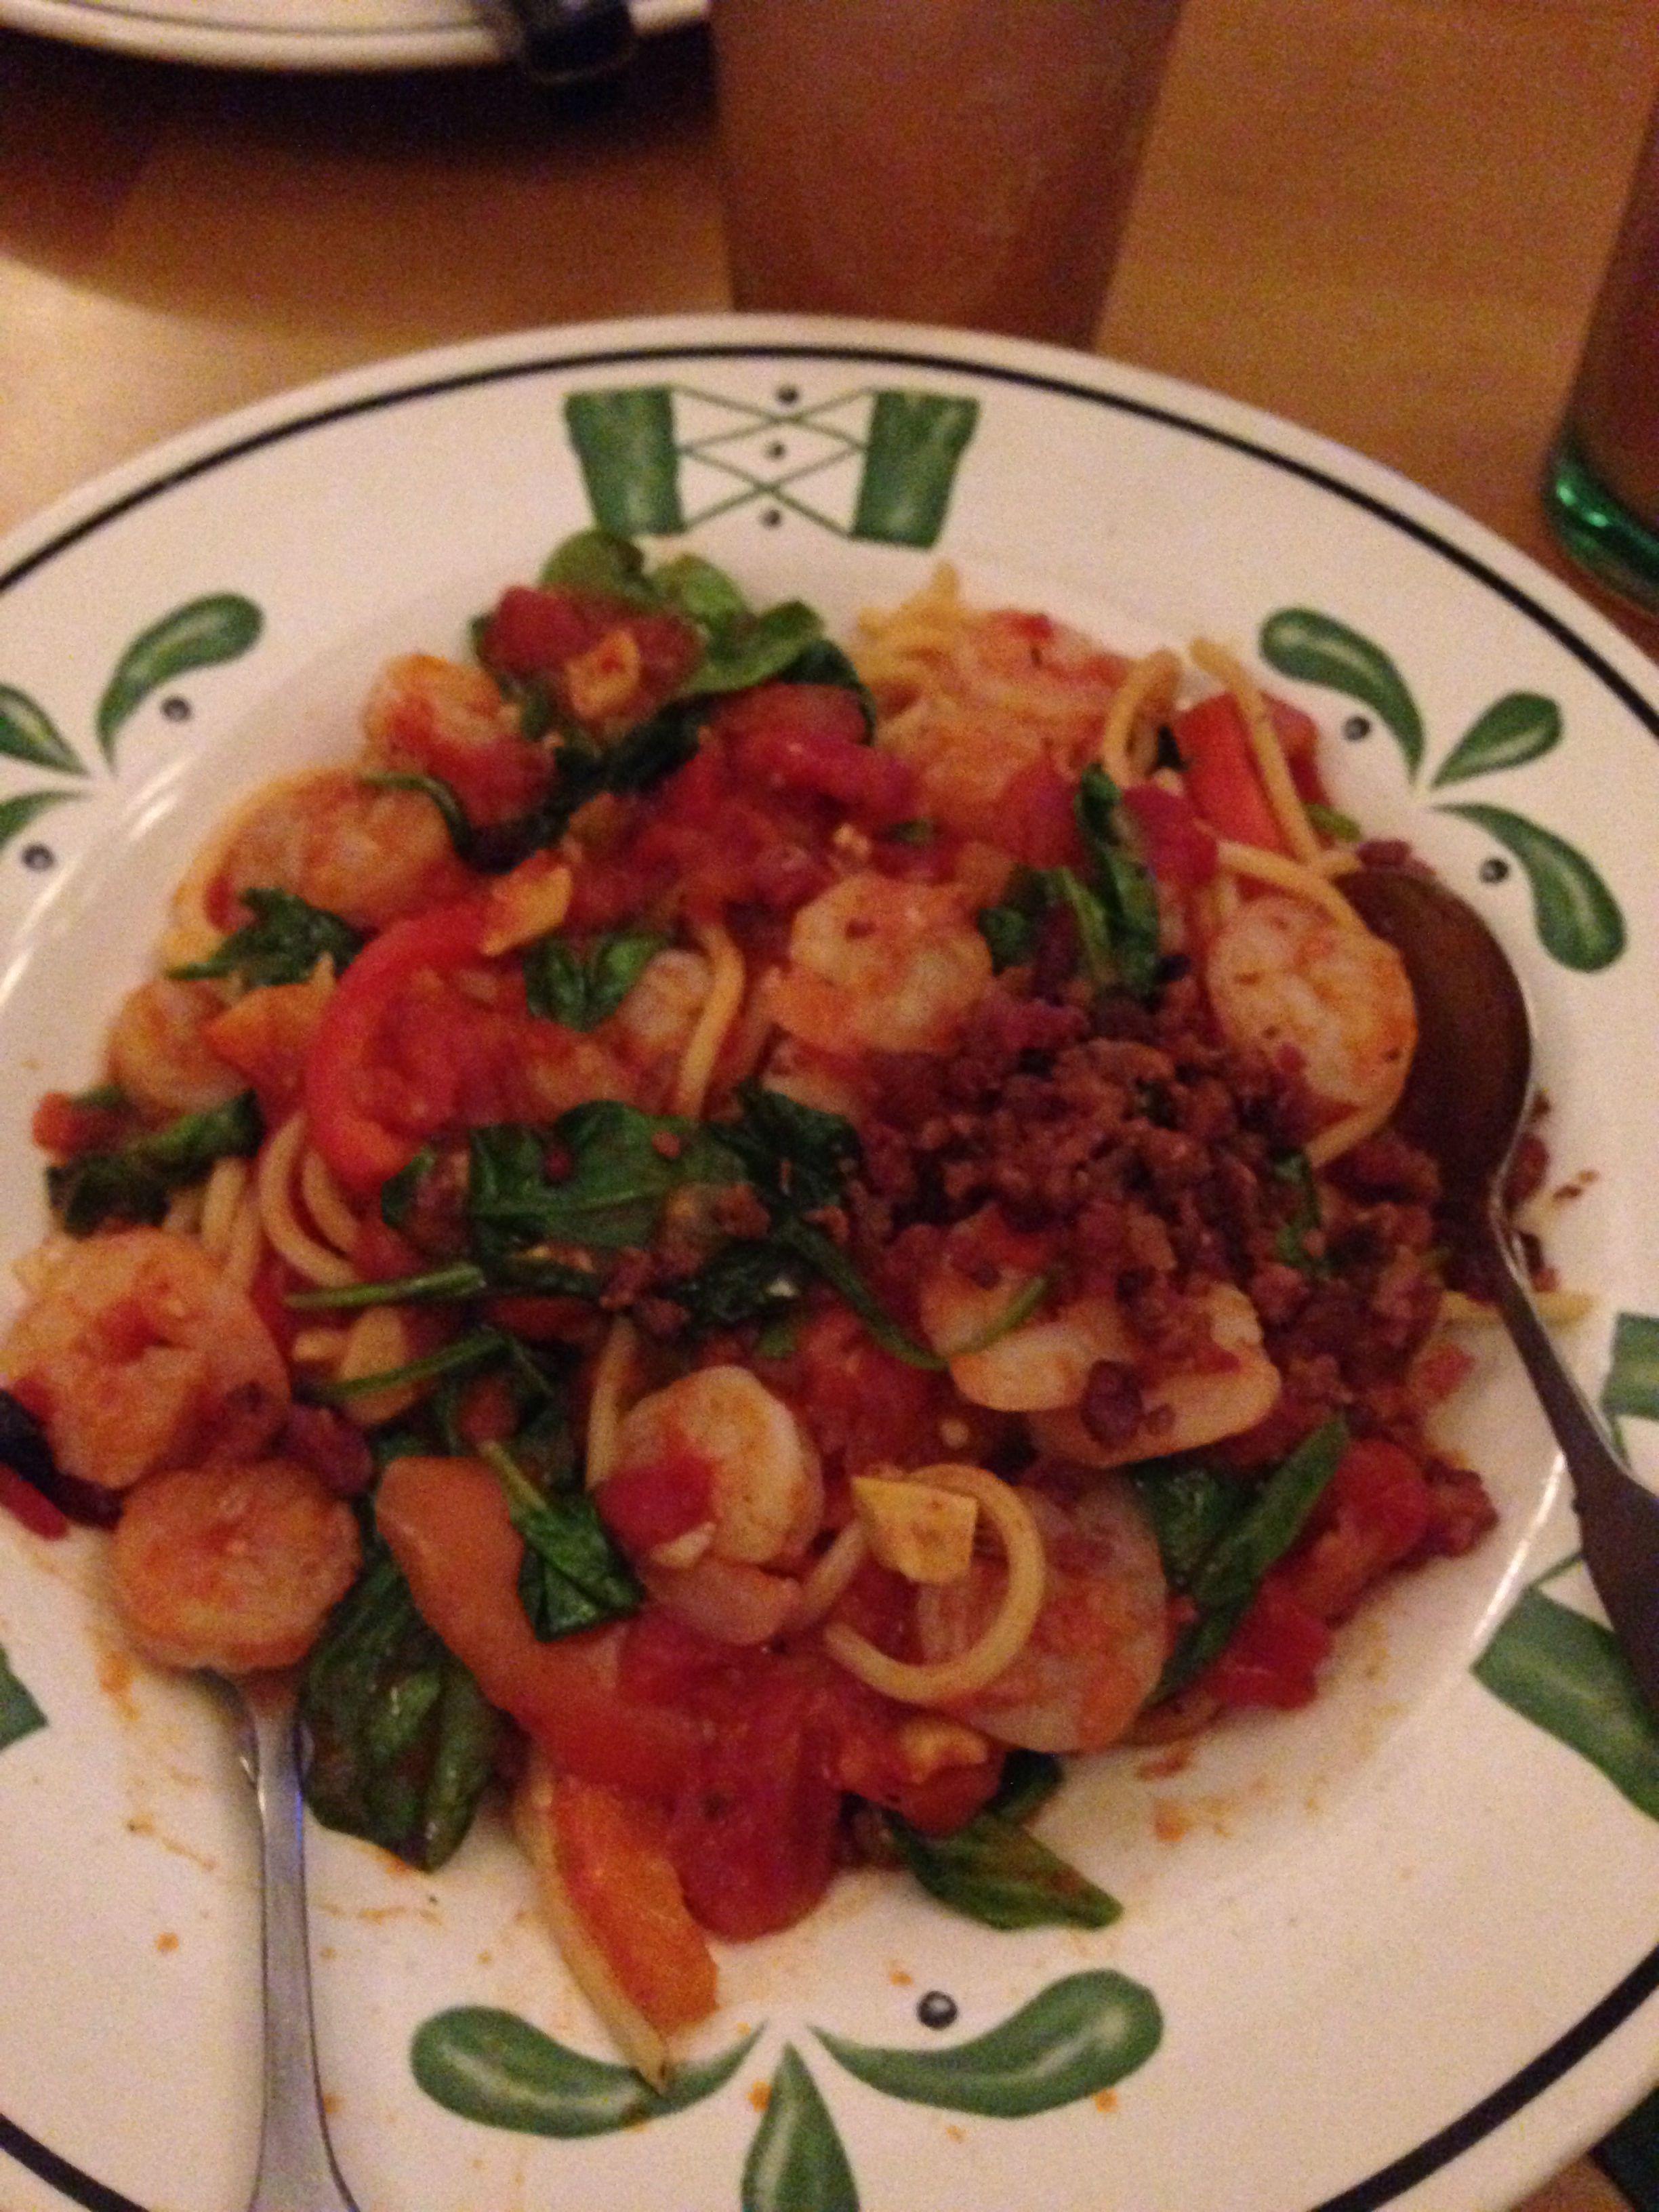 Olive Garden: spicy shrimp Vesuvio | food | Pinterest | Spicy shrimp ...